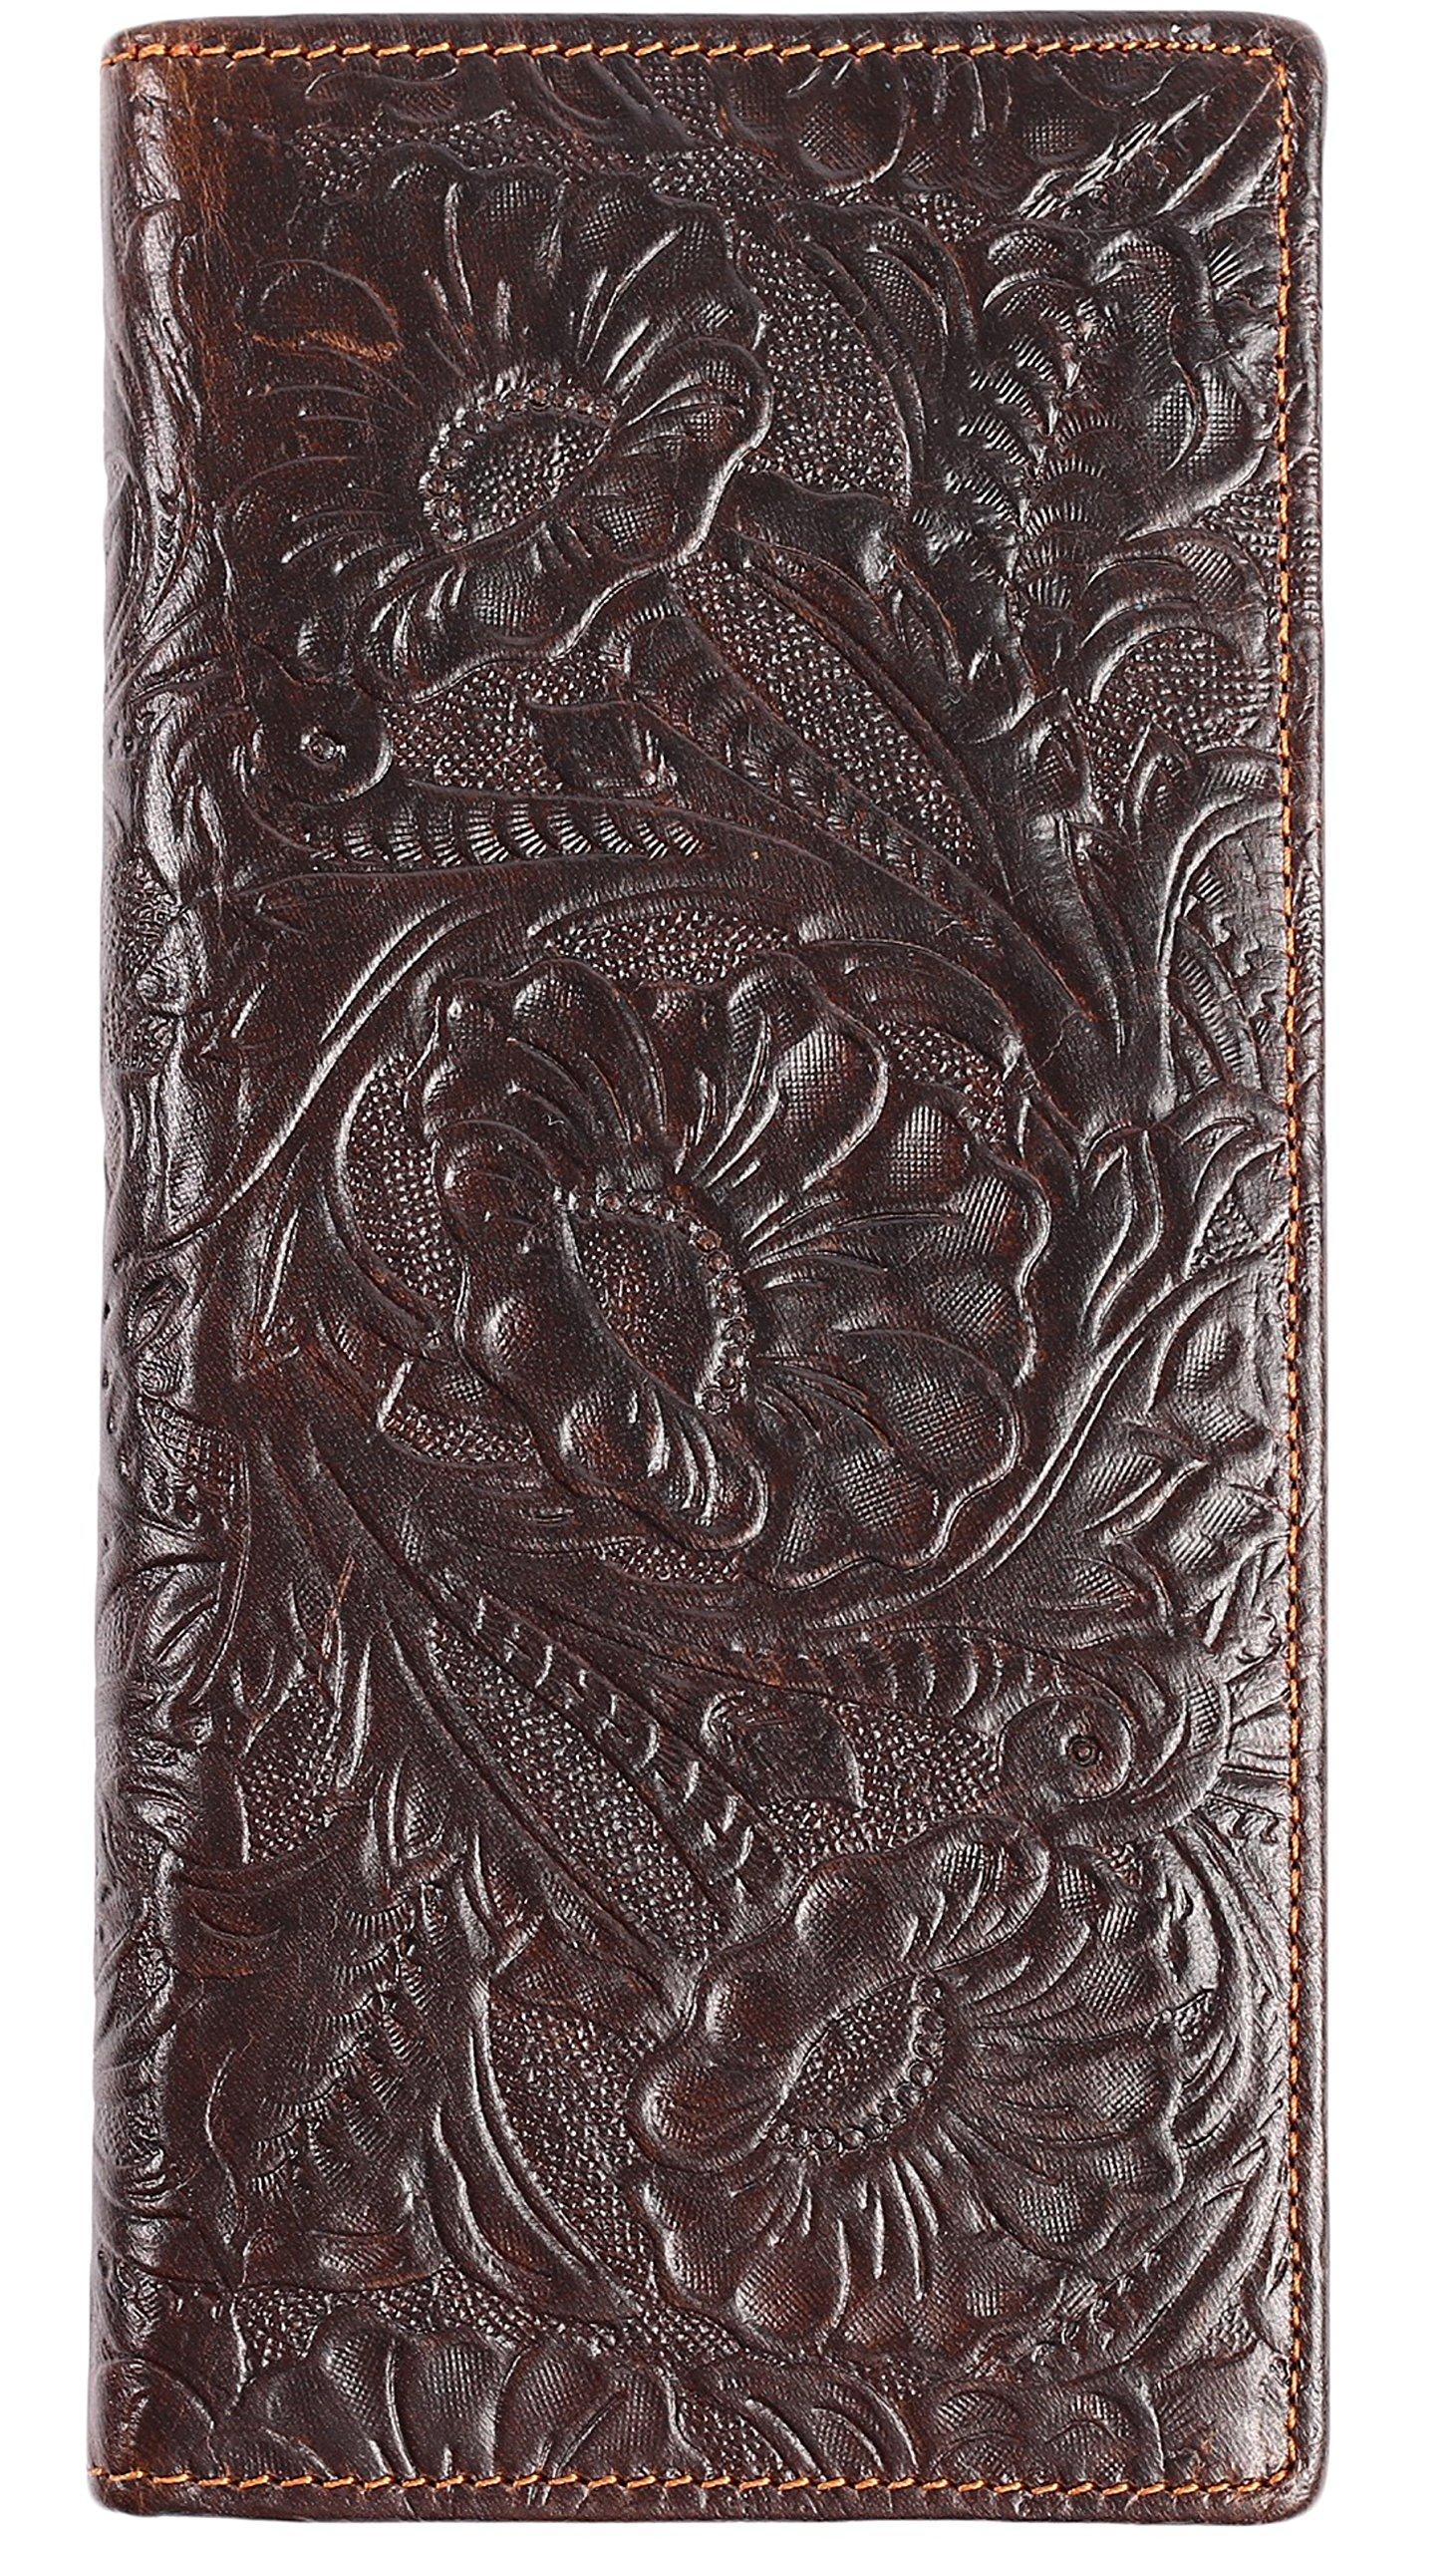 Womens Ladies Genuine Leather Wallet Long Embossing Bifold Wallet Clutch Purse (Coffee)